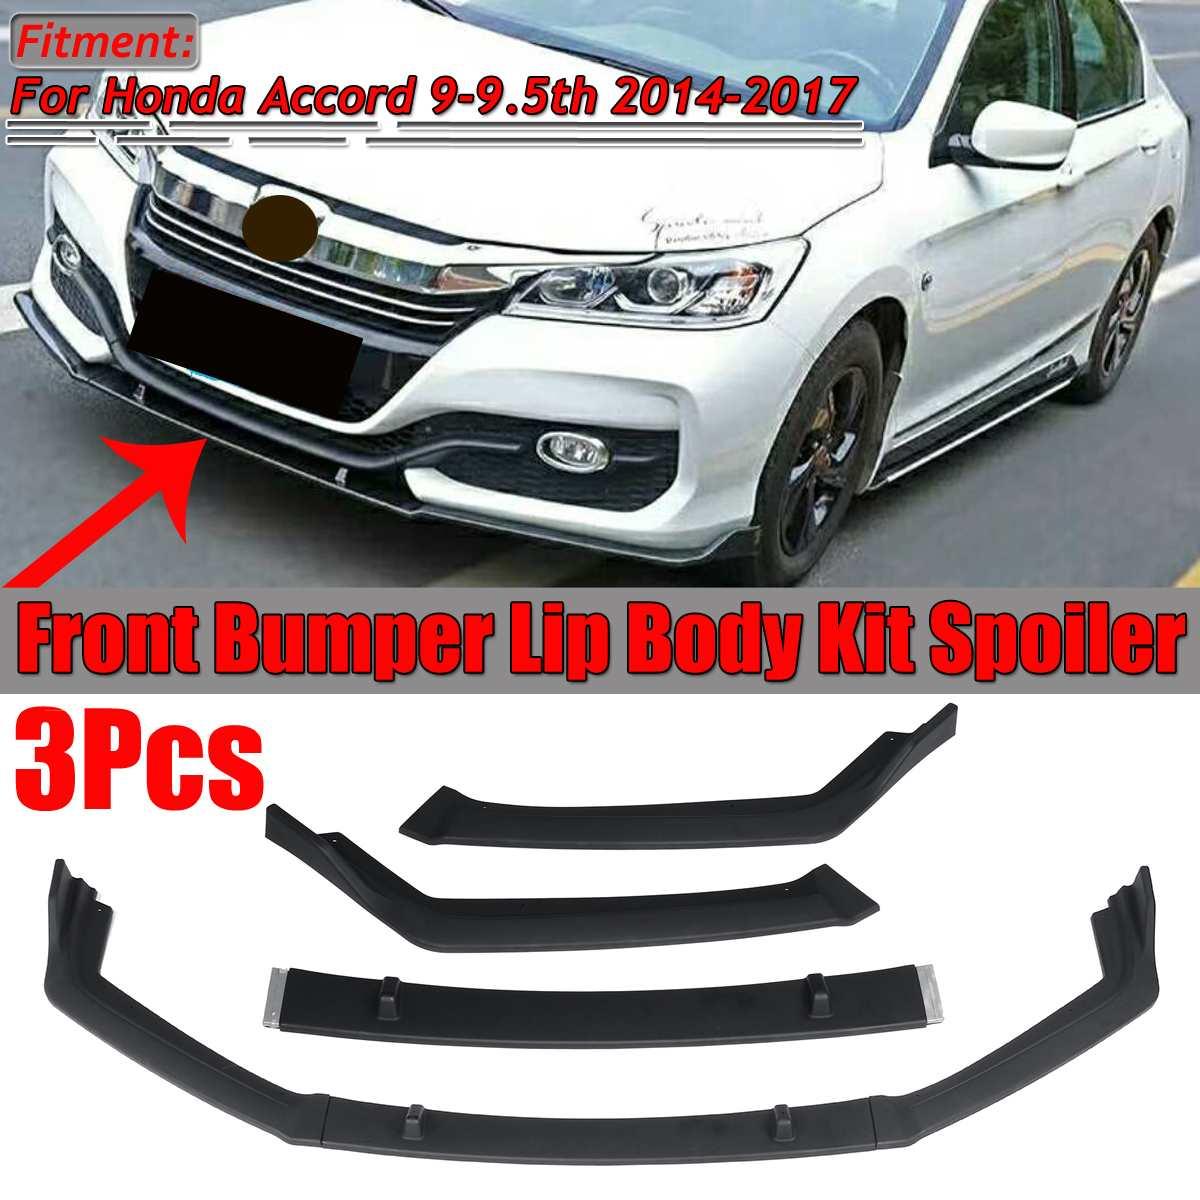 New 3PCS Car Front Bumper Splitter Lip Body Kit Spoiler Diffuser Deflector Lips For Honda For Accord 9-9.5th 2014 2015 2016 2017